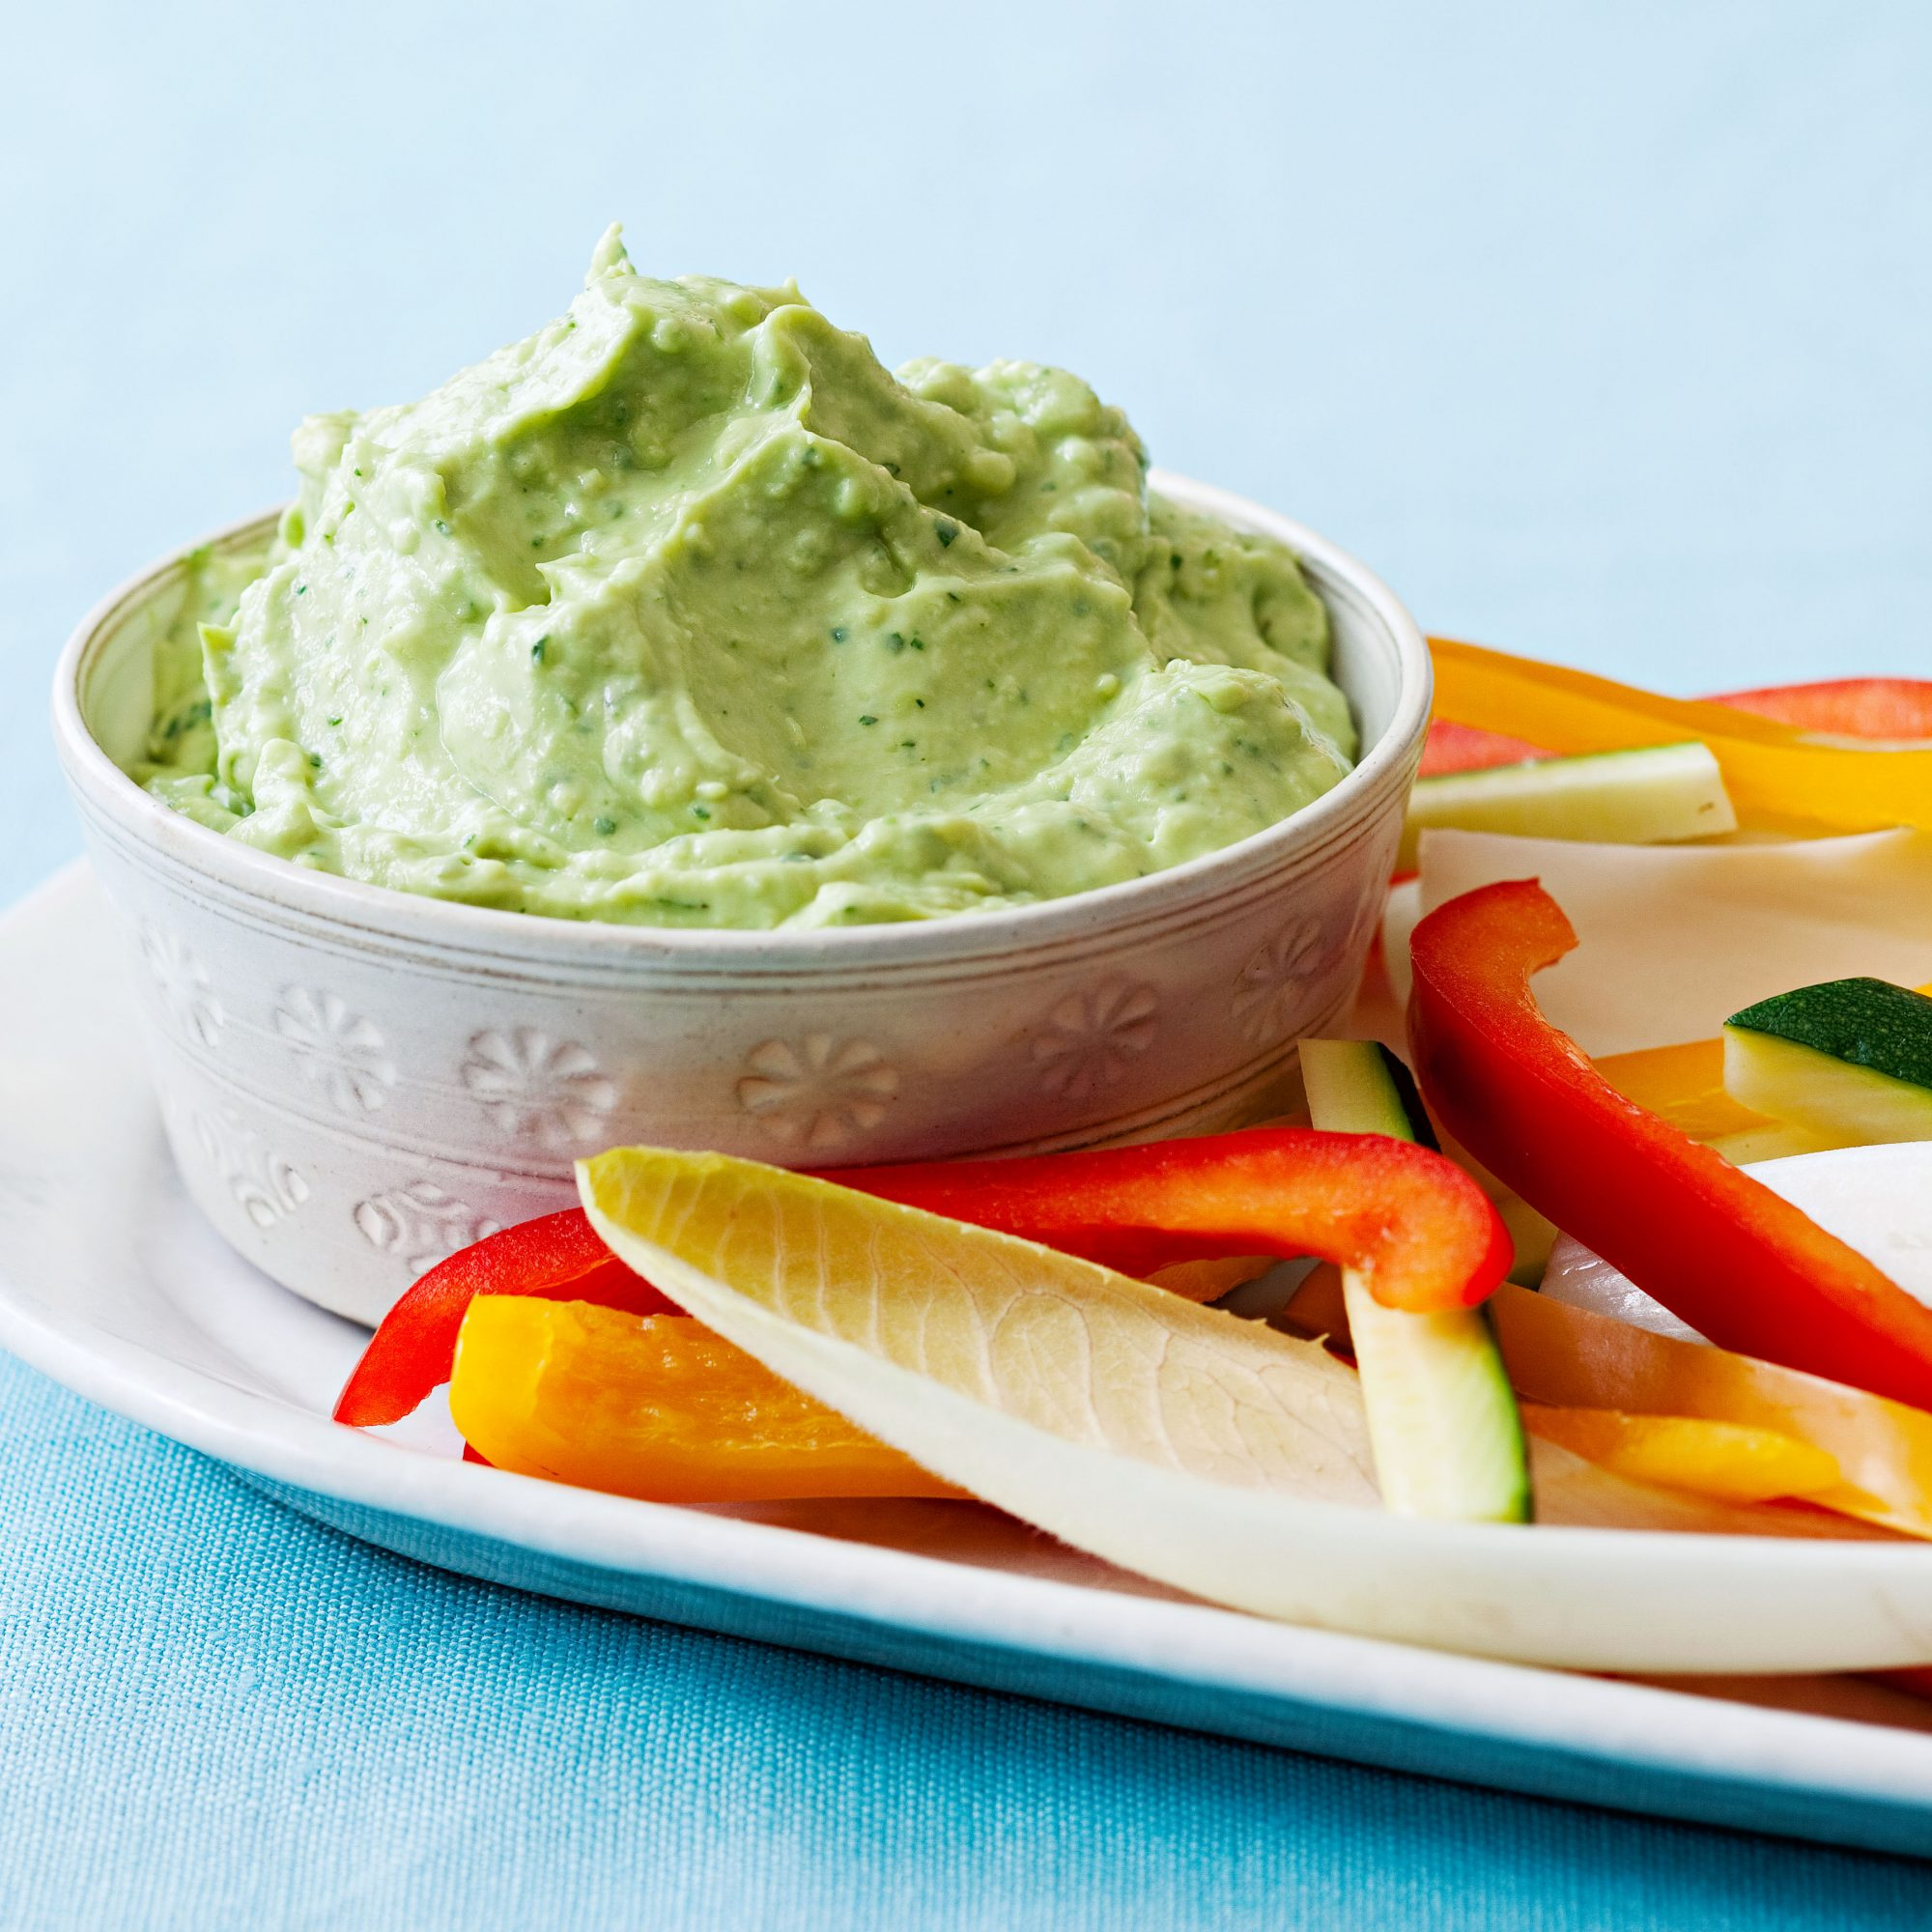 Creamy Avocado-Cilantro Dip